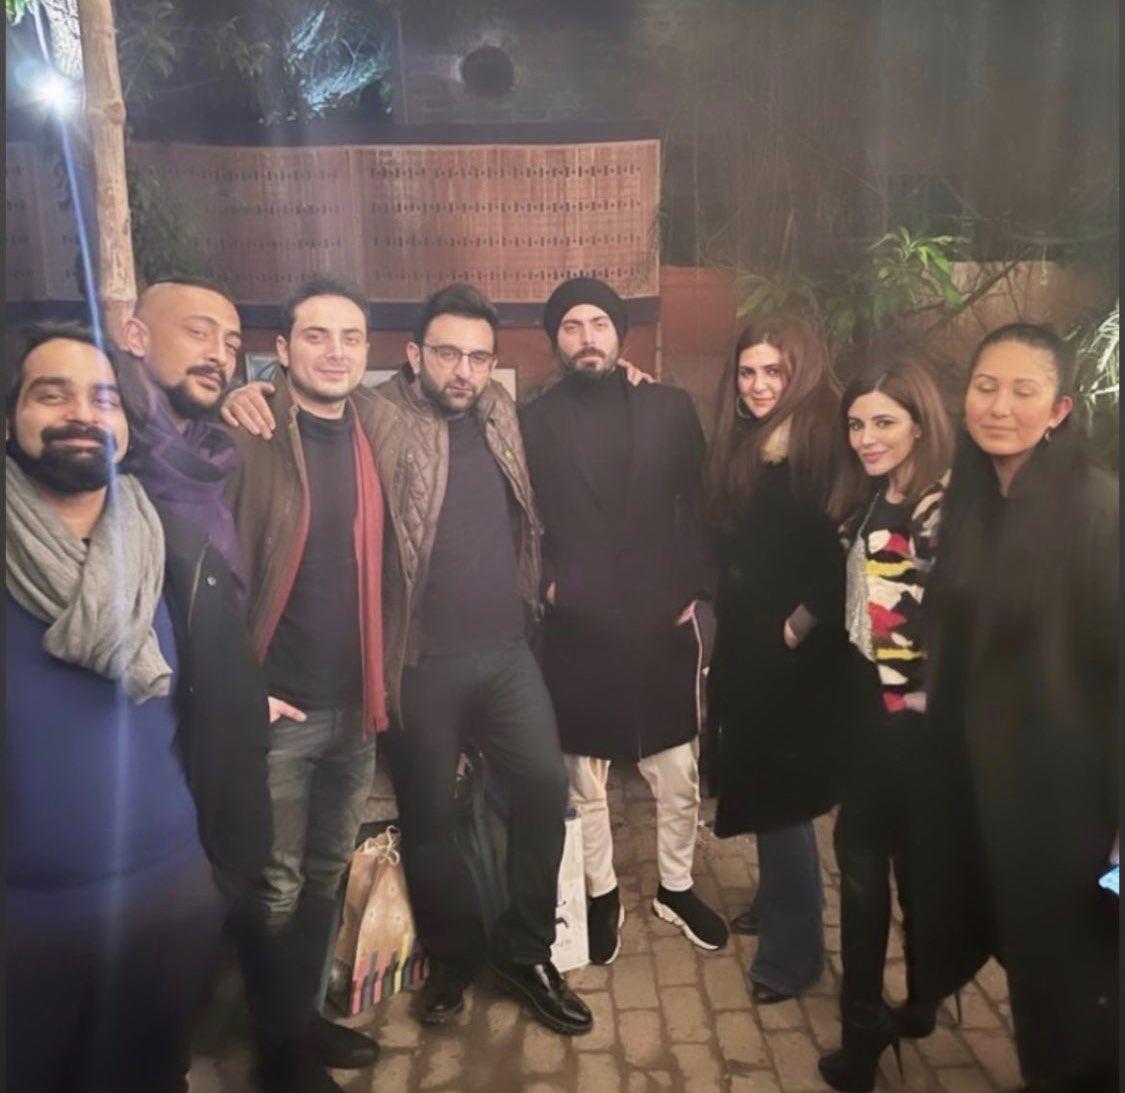 The Legend of Maula Jatt team gets together at Ammara Hikmat's place for hubby Asad Khan's birthday 🥳🎉 #FawadKhan #AmmaraHikmat #BilalLashari #ZaraShahjahan #AsadJKhan #FarisShafi